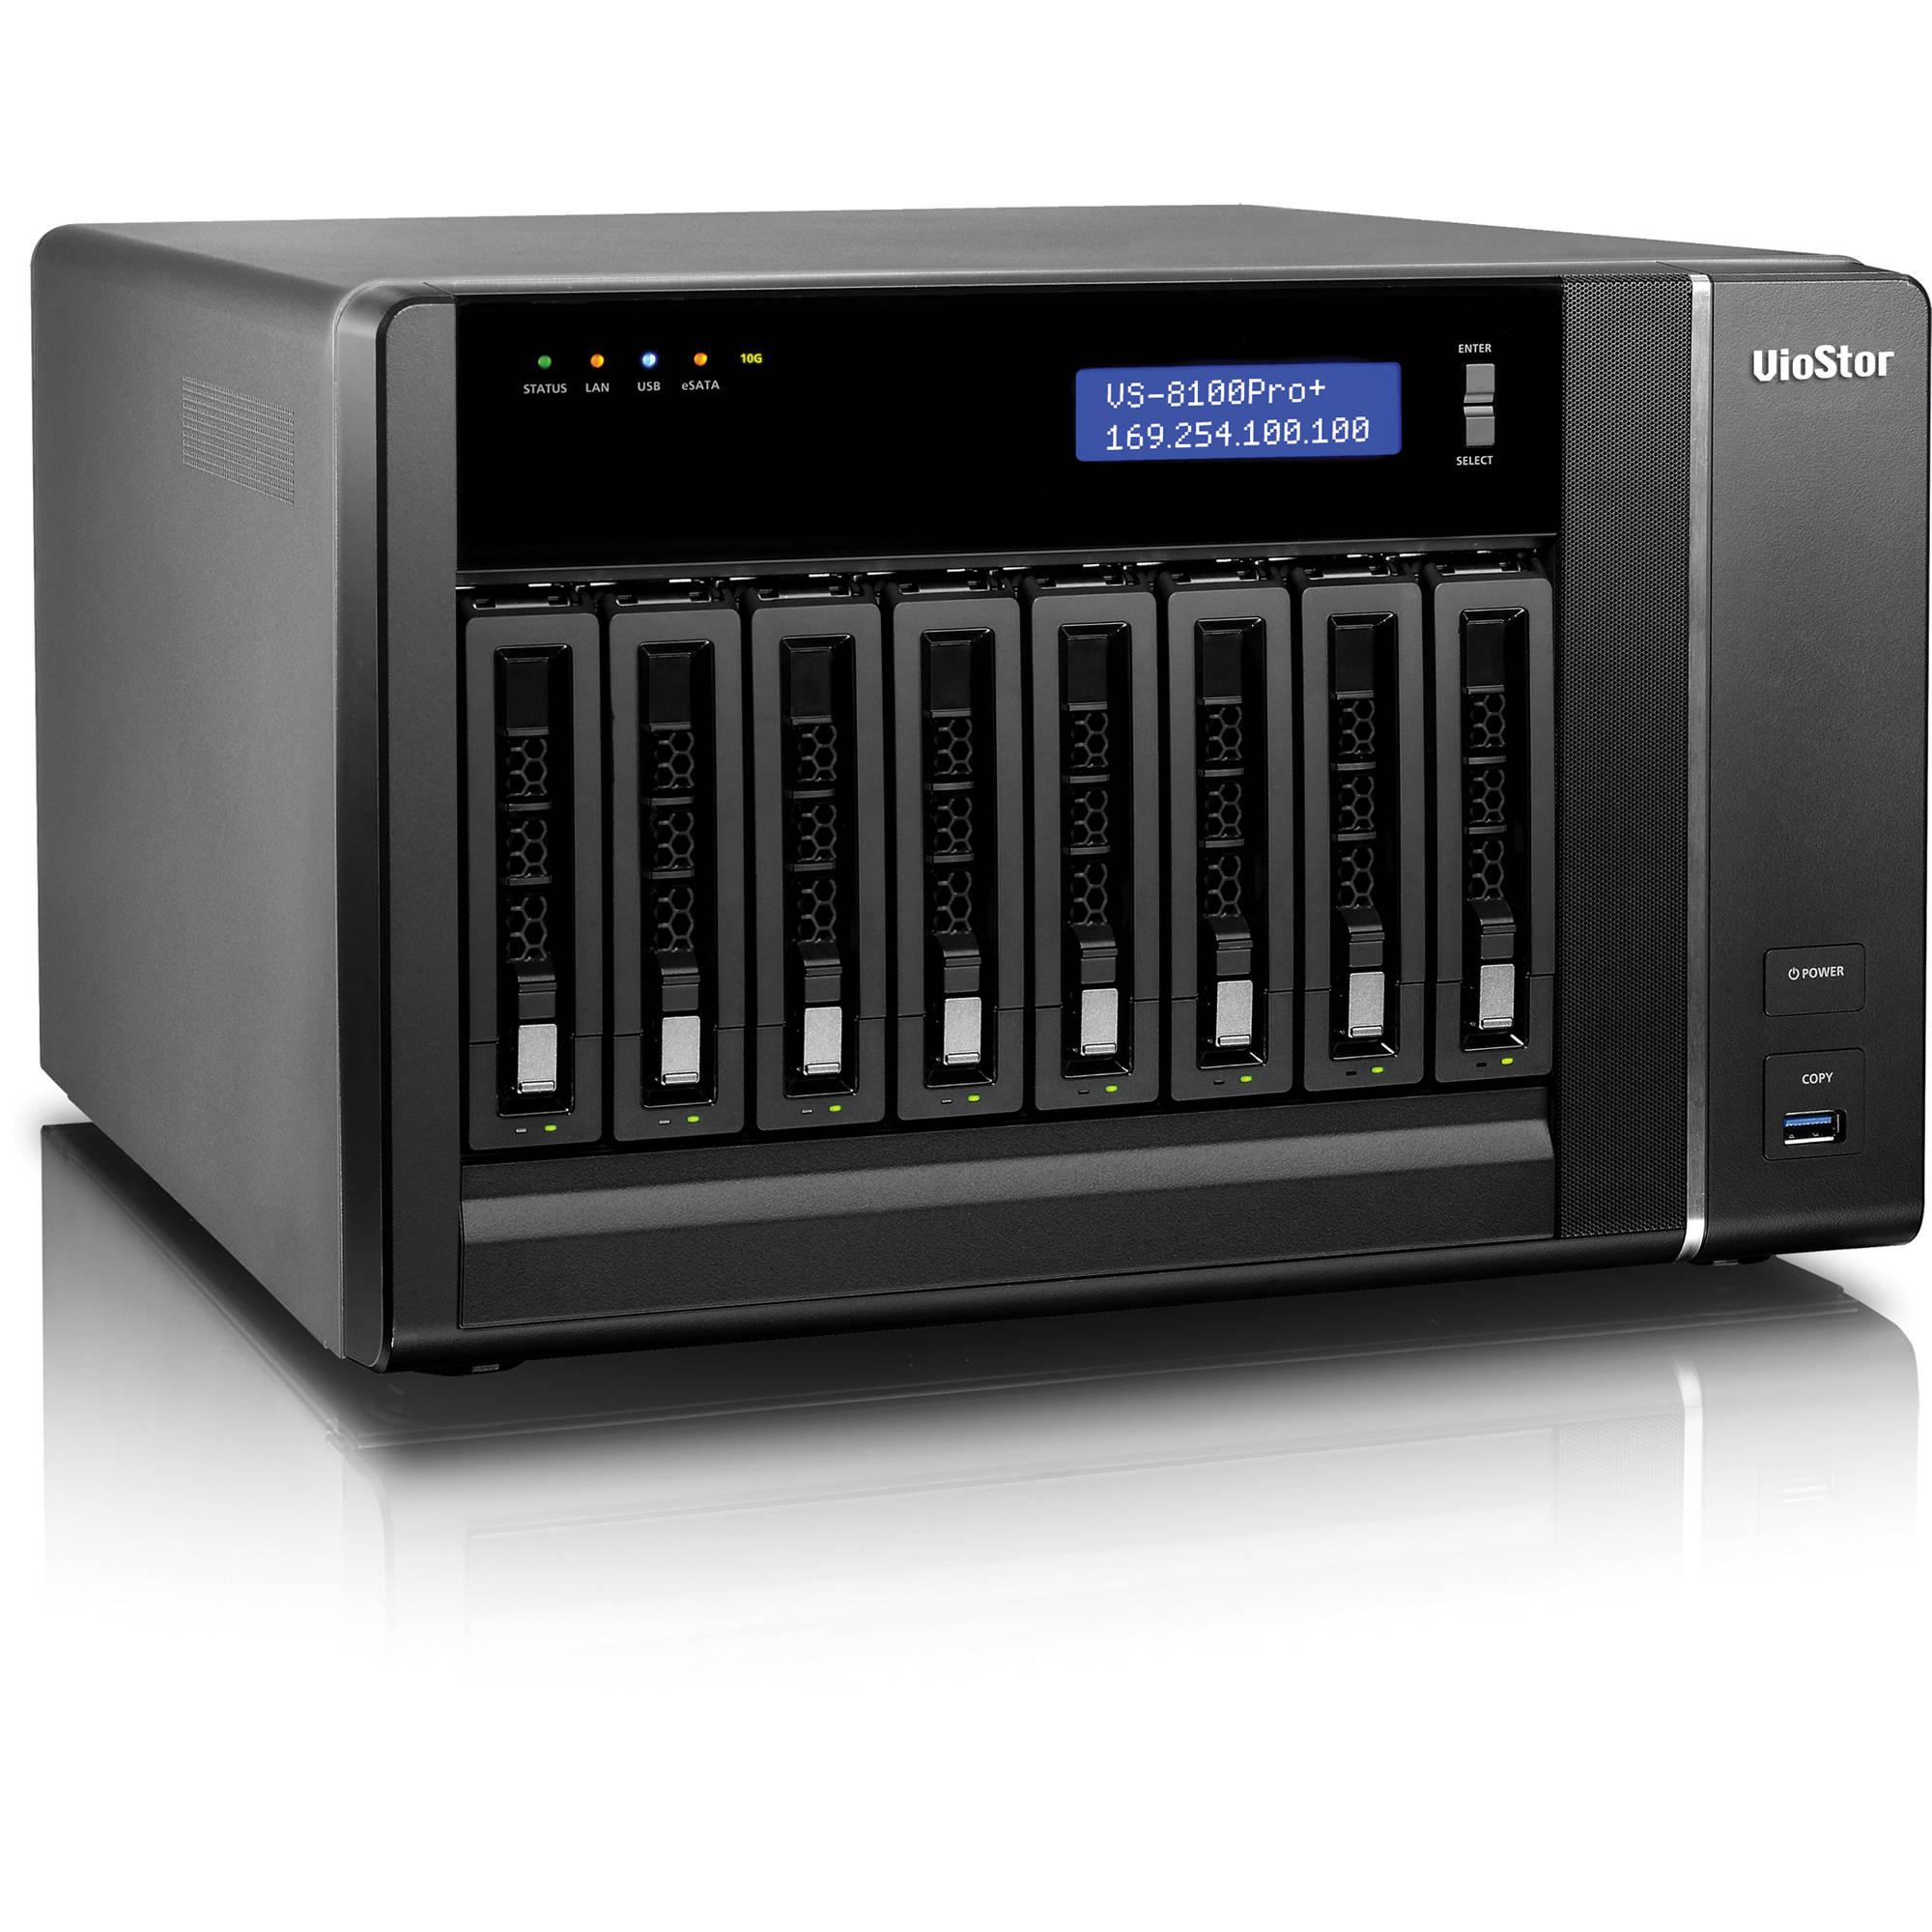 QNAP VS-8132 Pro+ NVR Treiber Windows 10